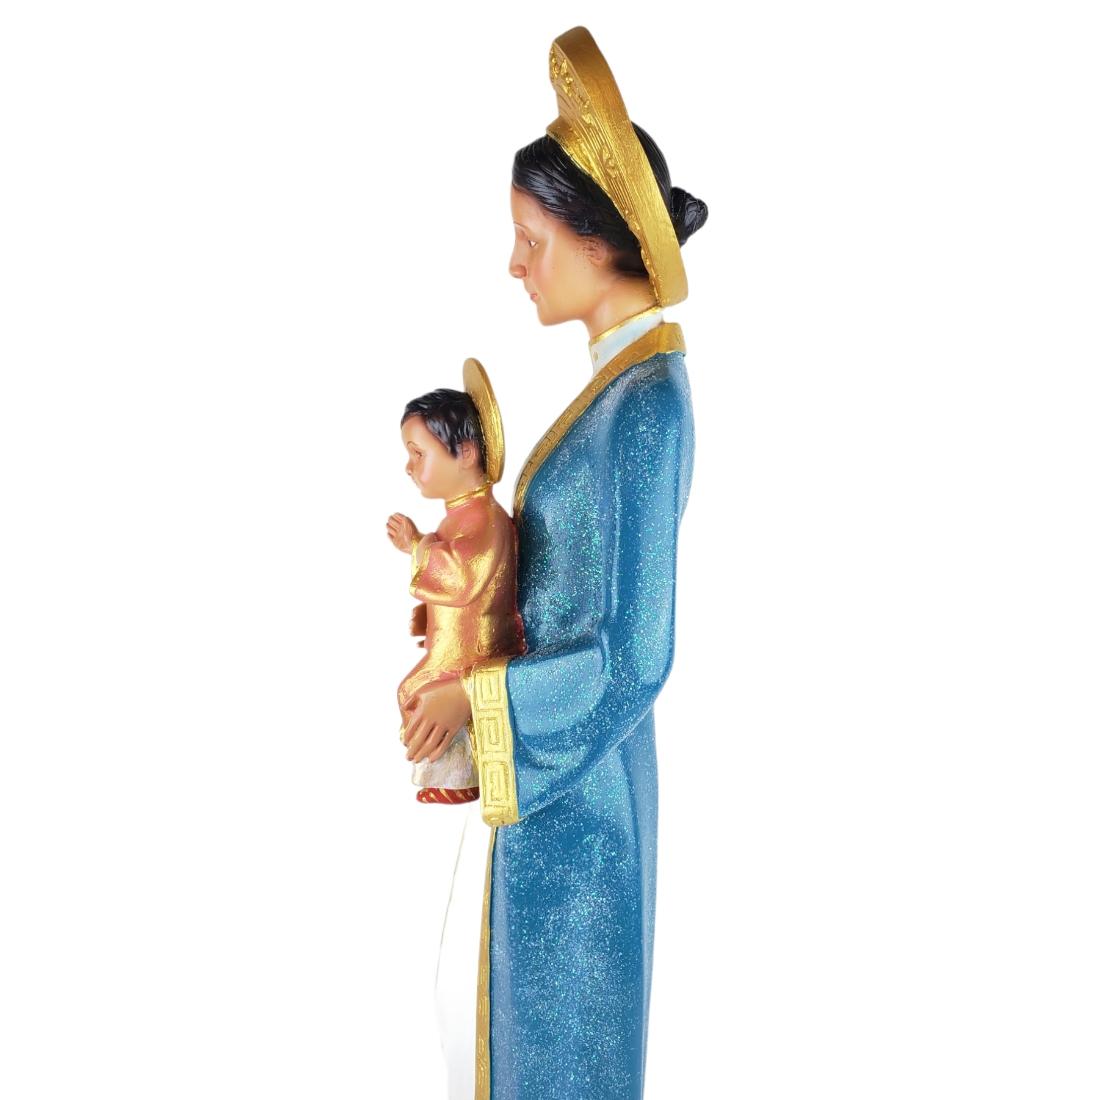 Escultura Nossa Senhora de La Vang Padroeira do Vietnã